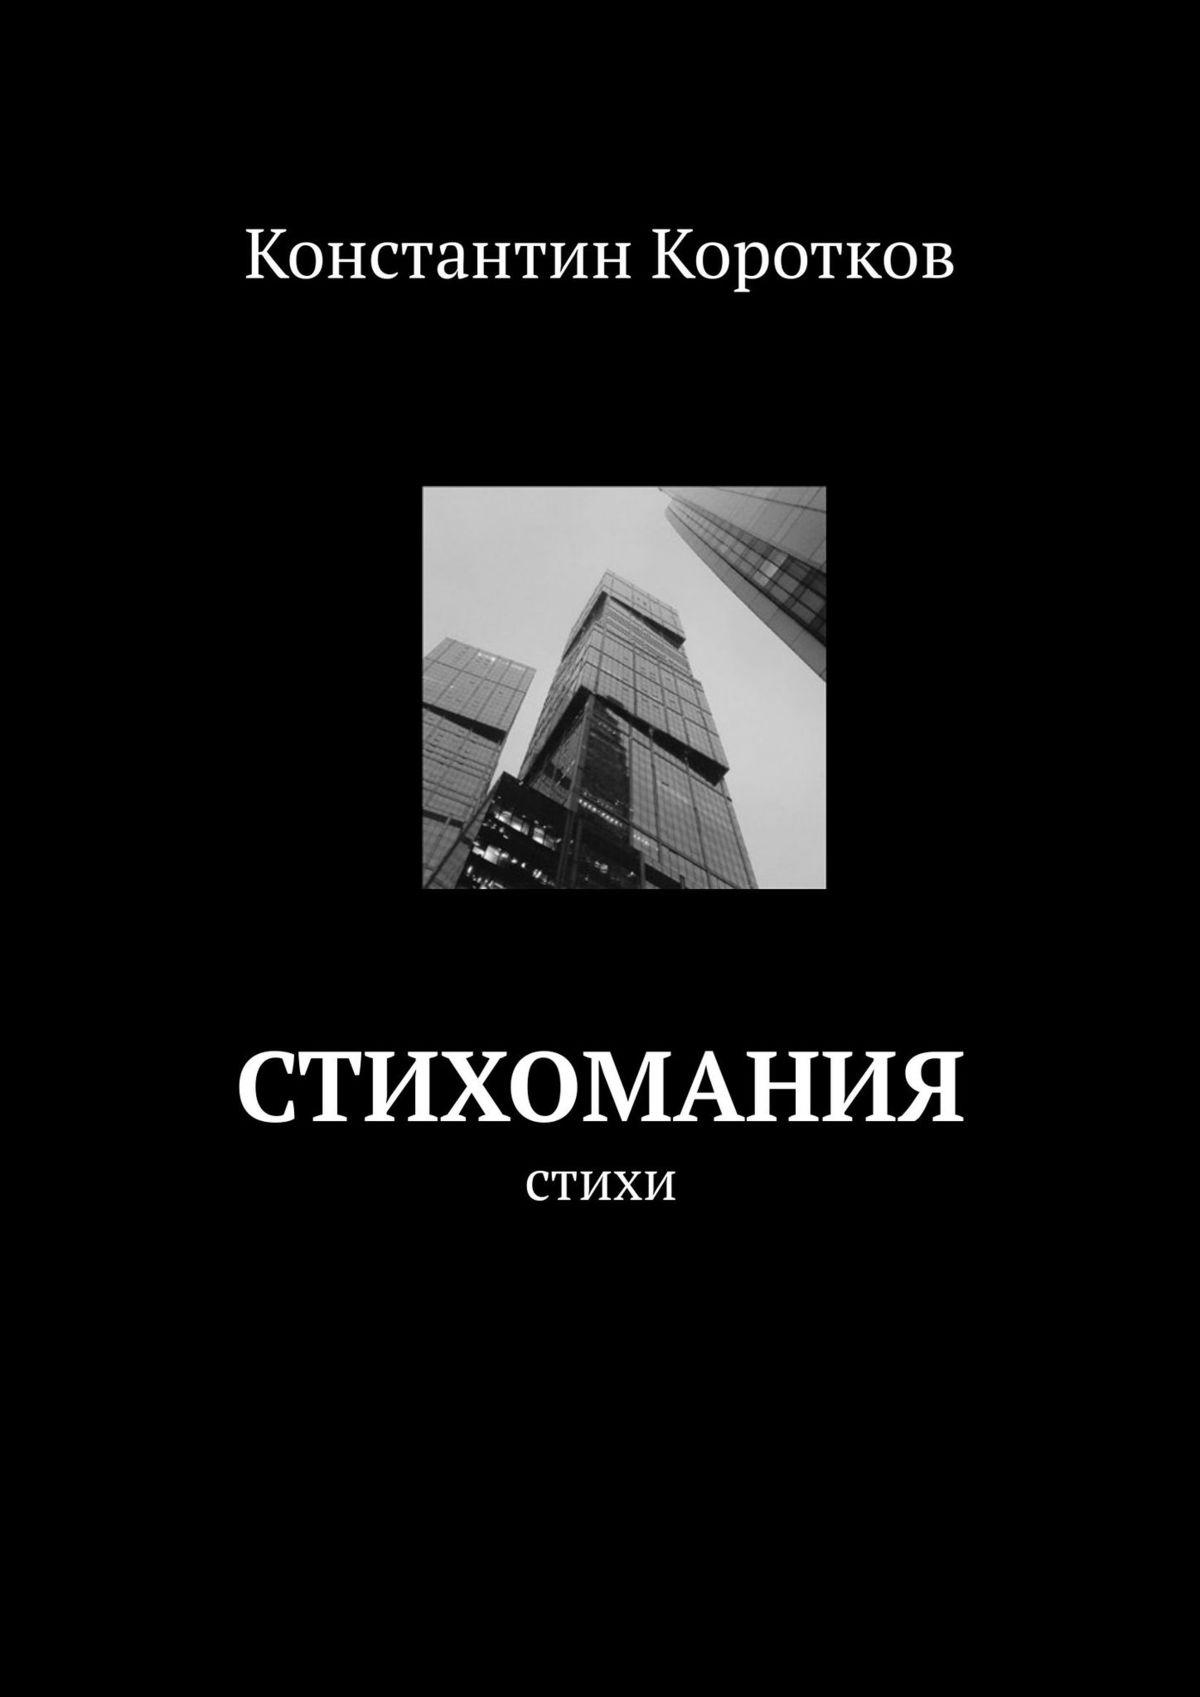 Константин Коротков. Стихомания